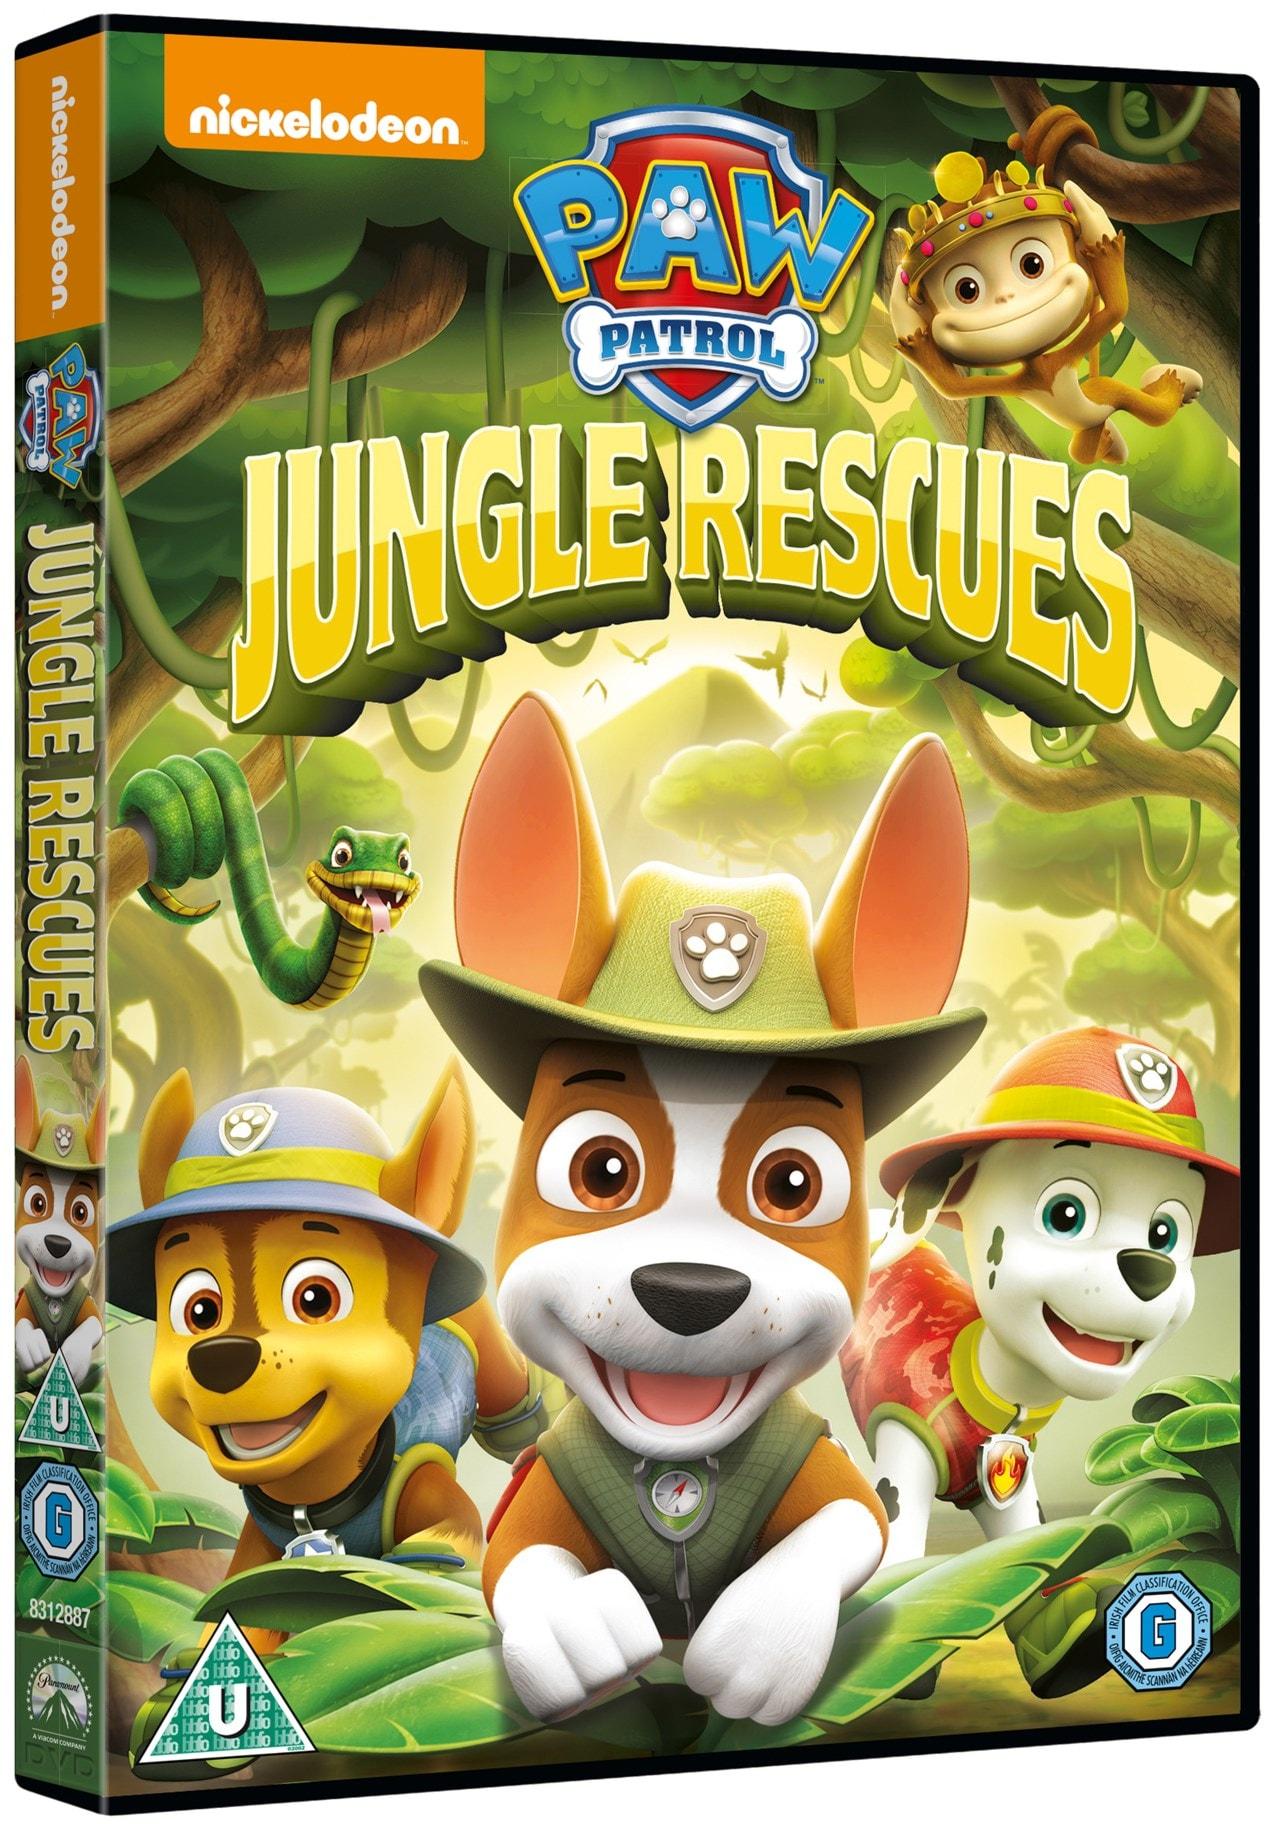 Paw Patrol: Jungle Rescues - 2